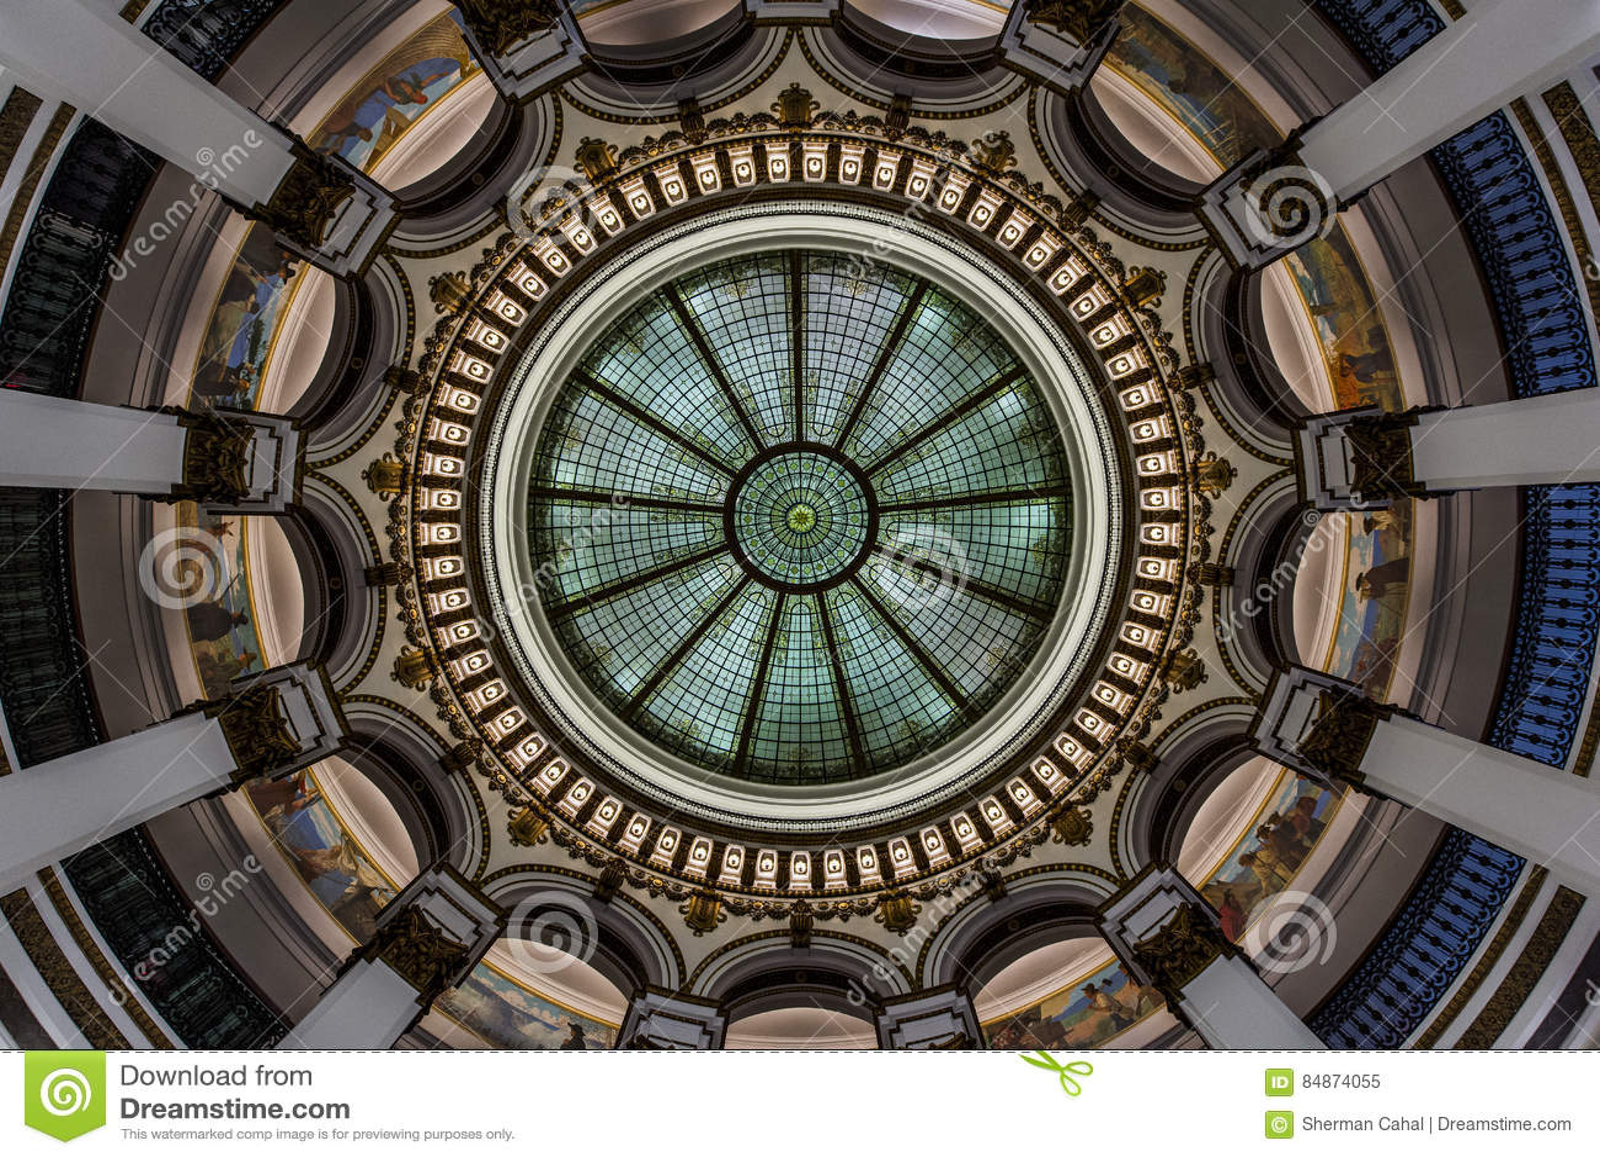 Bóveda de cristal - edificio histórico - Cleveland céntrica, Ohio